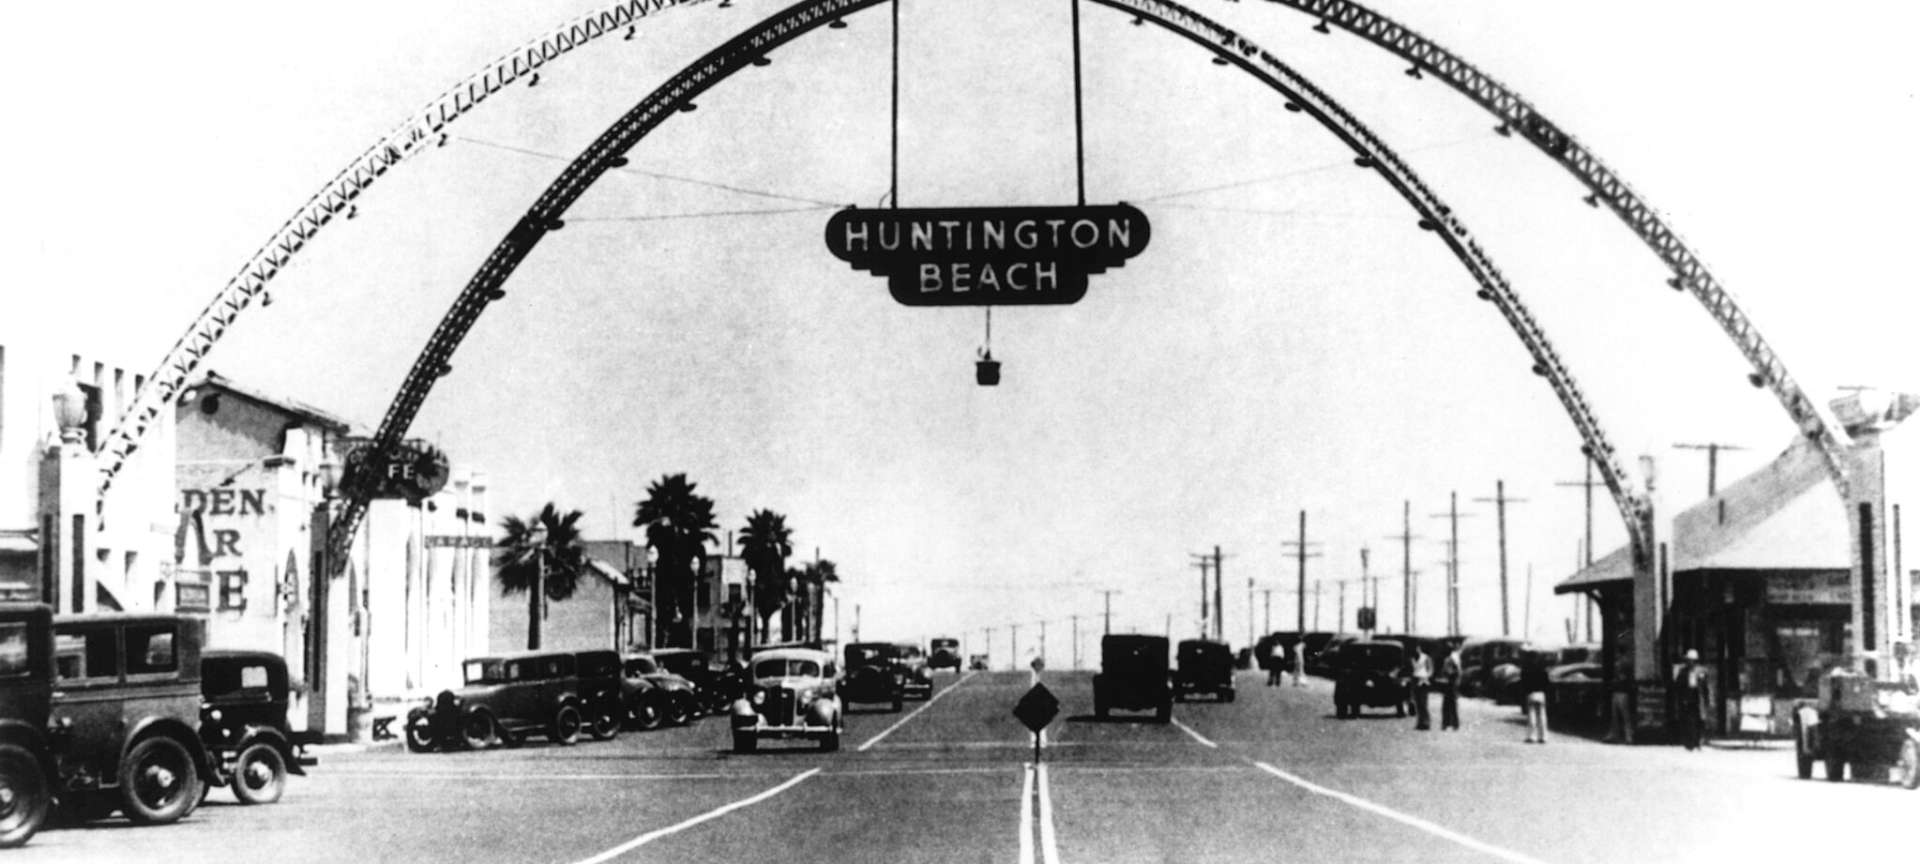 Huntington Beach Historical Walking Tour